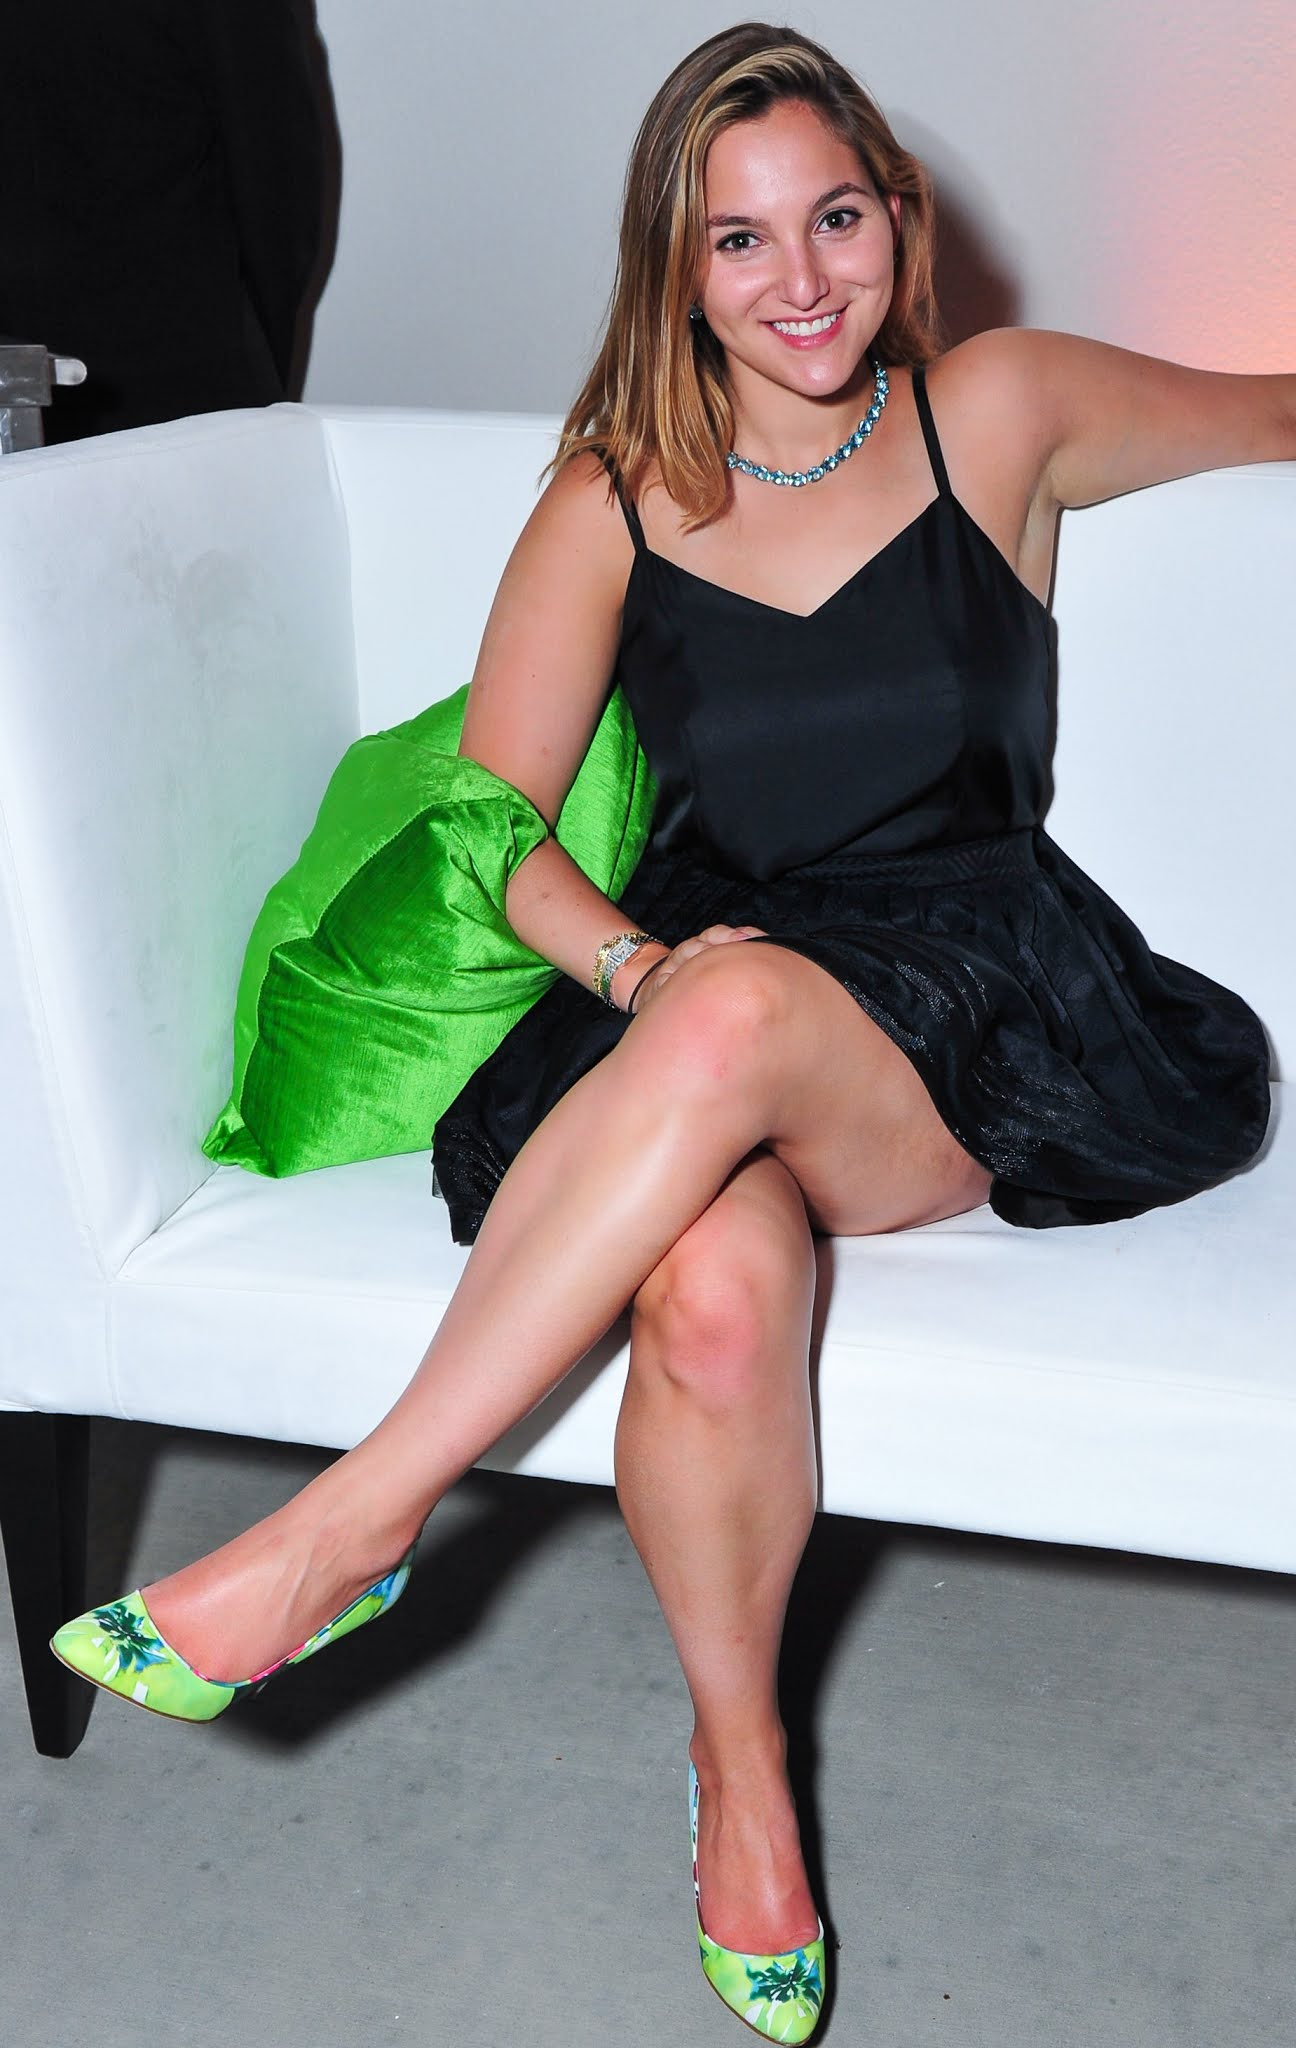 brunette threesom legged blonde curvy Long